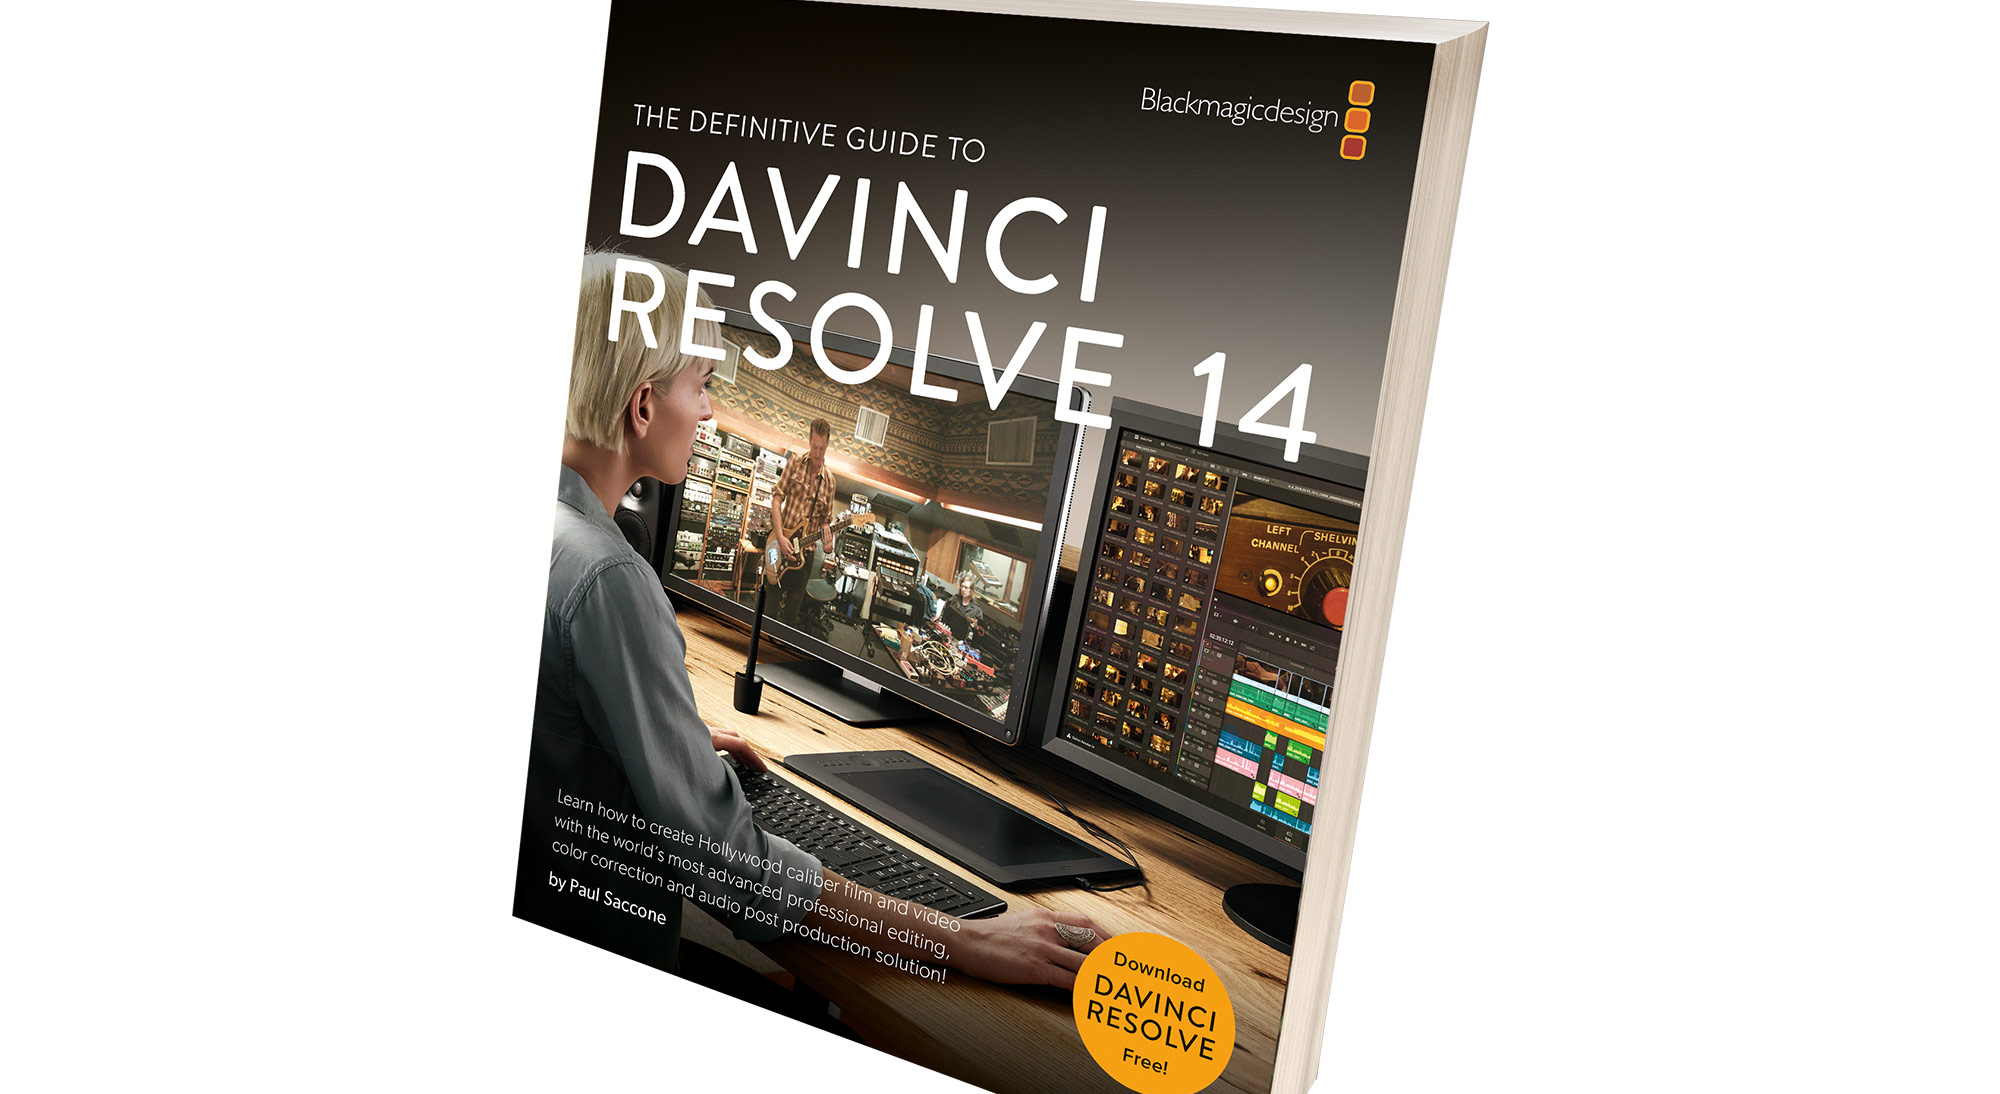 Blackmagic Design Announces New Training Certification Program For Davinci Resolve 14 Shootonline